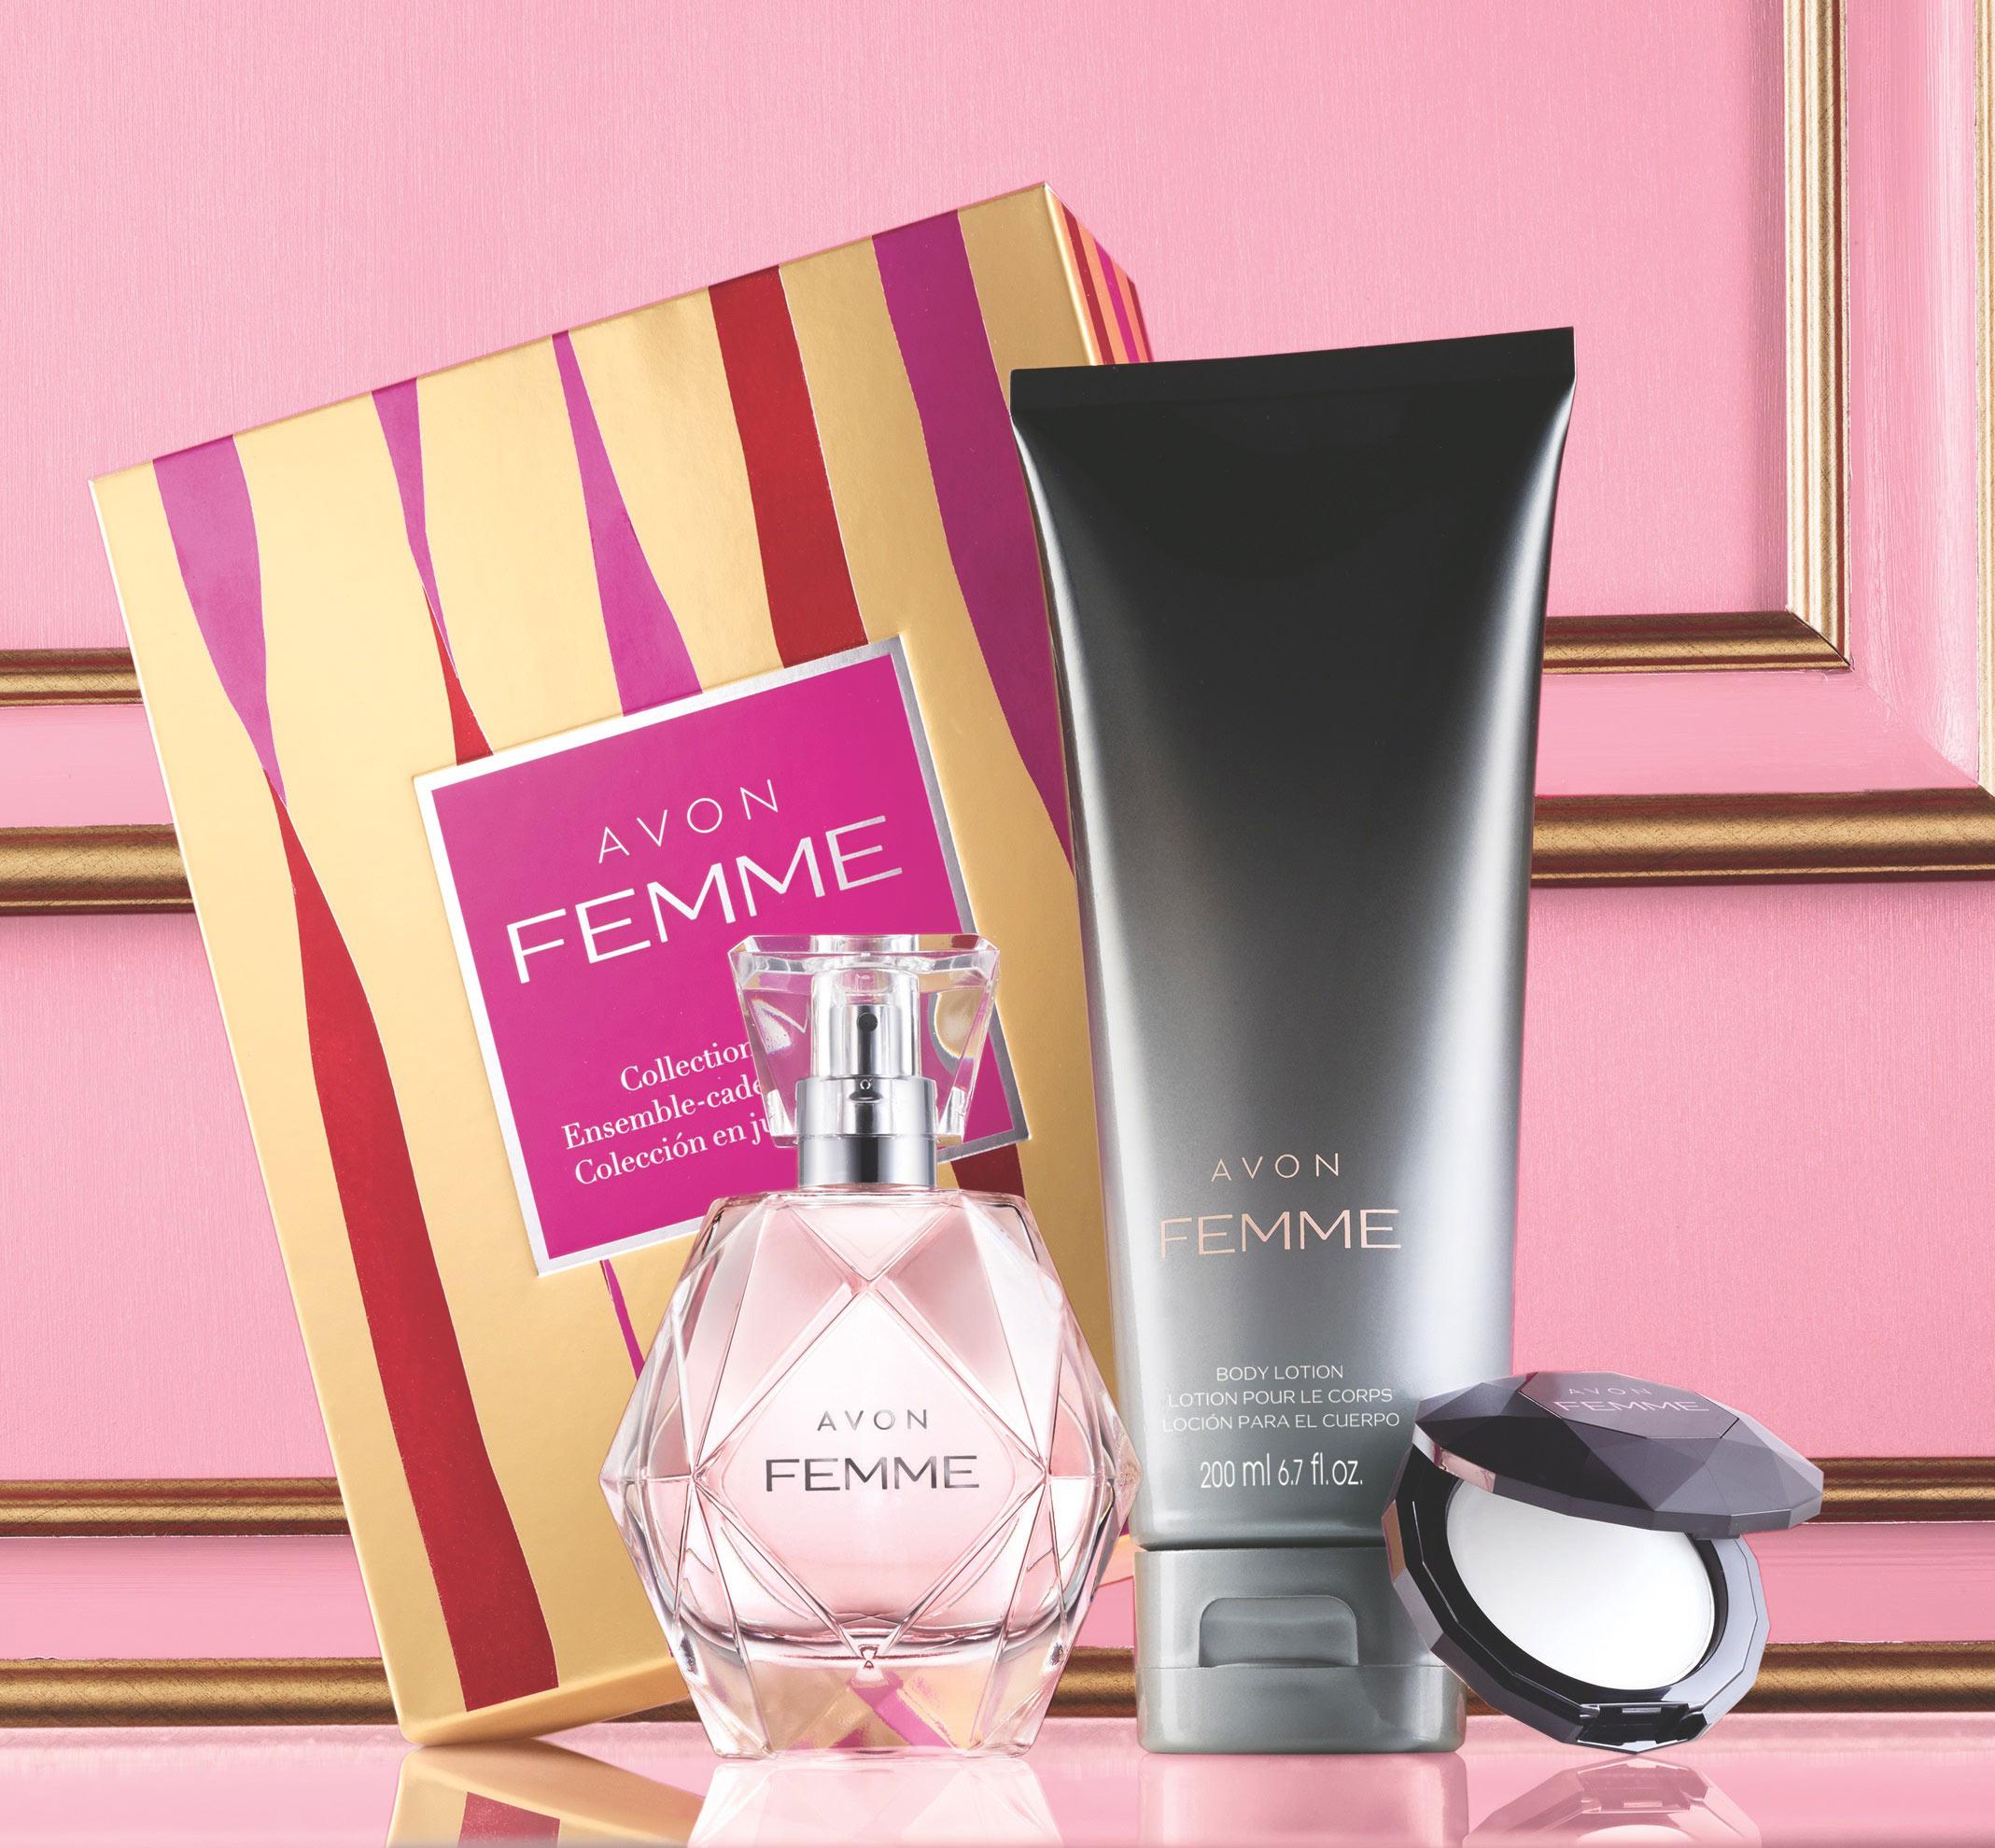 Avon products косметика skinceuticals купить в москве